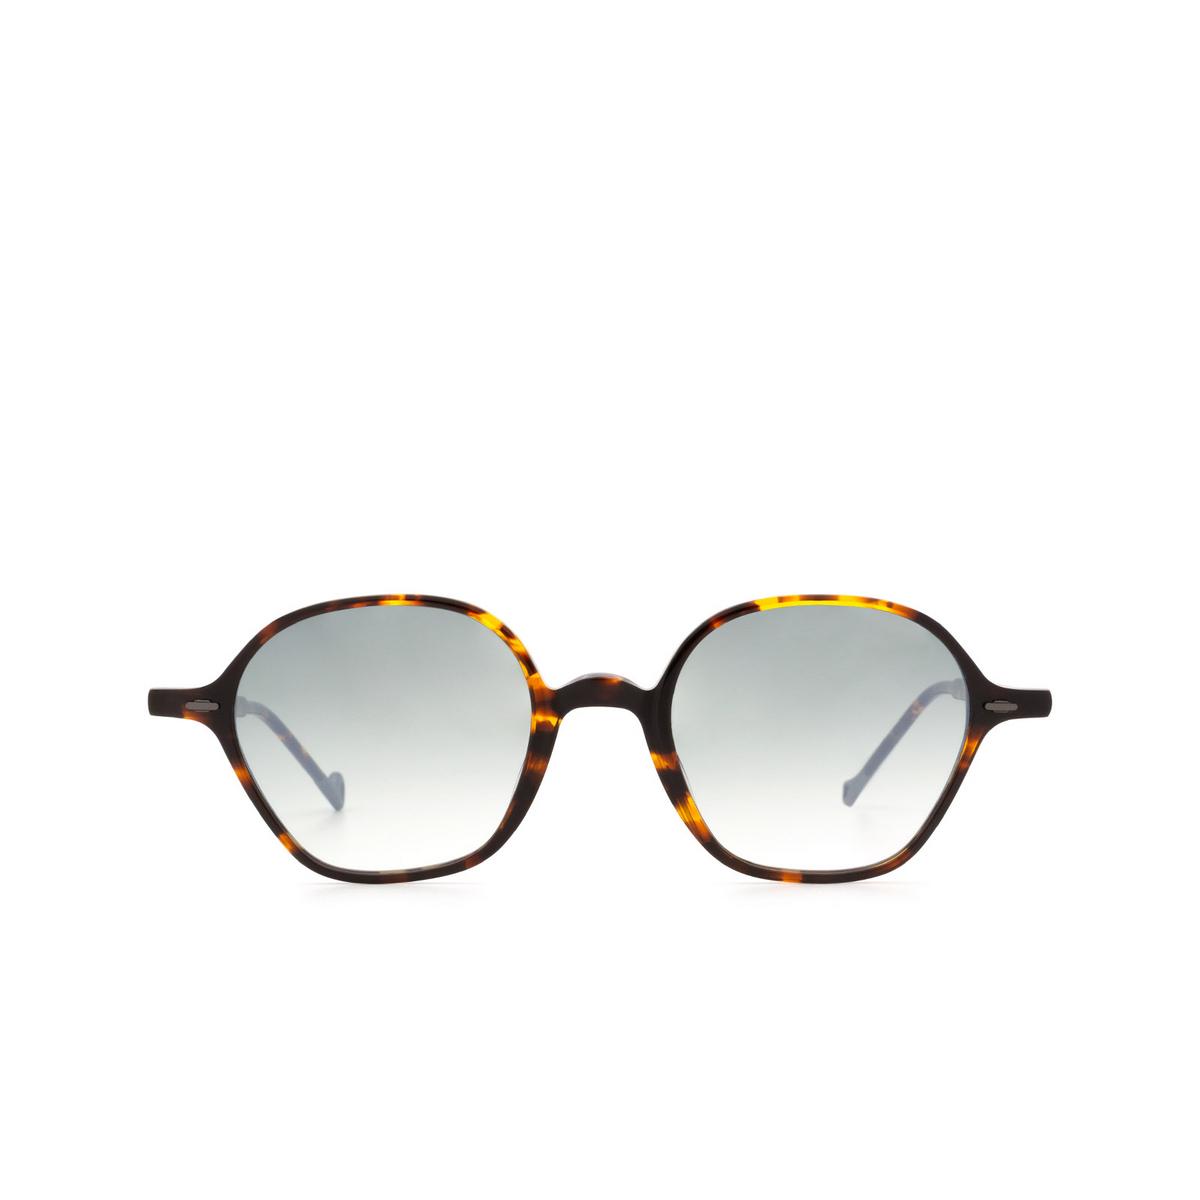 Eyepetizer® Irregular Sunglasses: Visconti color Dark Havana C.I-25F - front view.